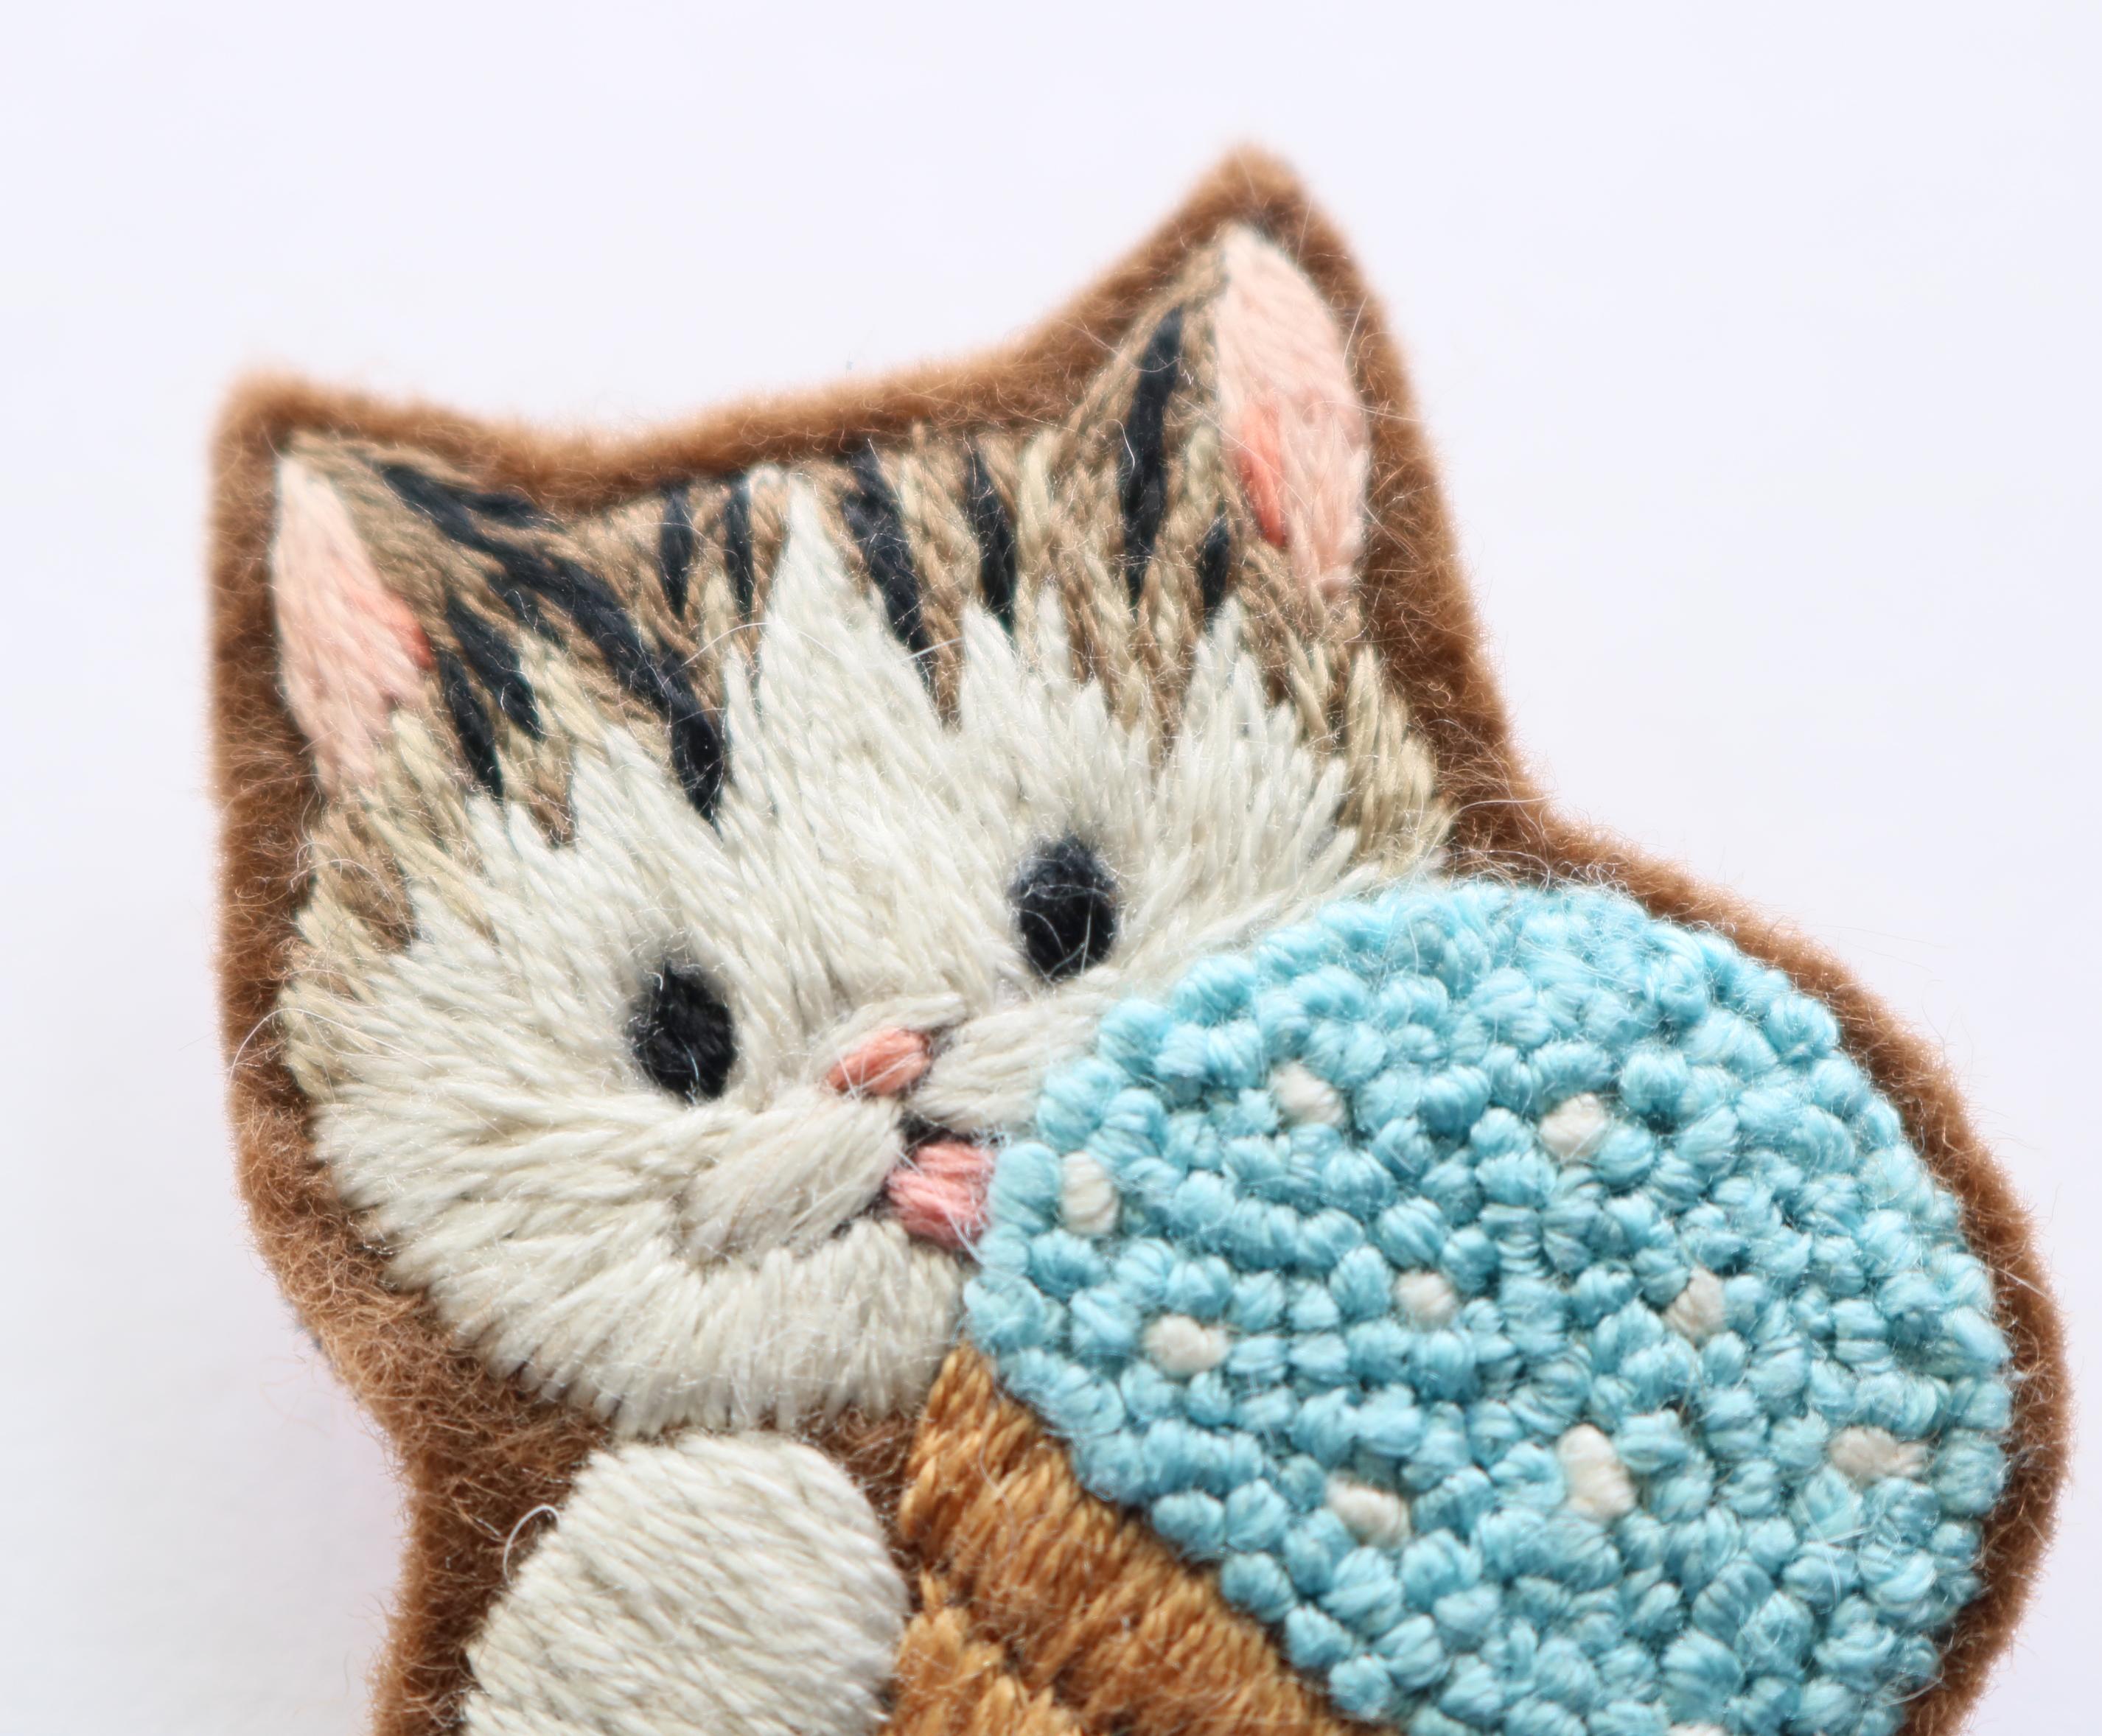 chic_chic_cat 刺繍ブローチ ハンドメイド 猫雑貨 猫グッズ 秋田 かぎしっぽ